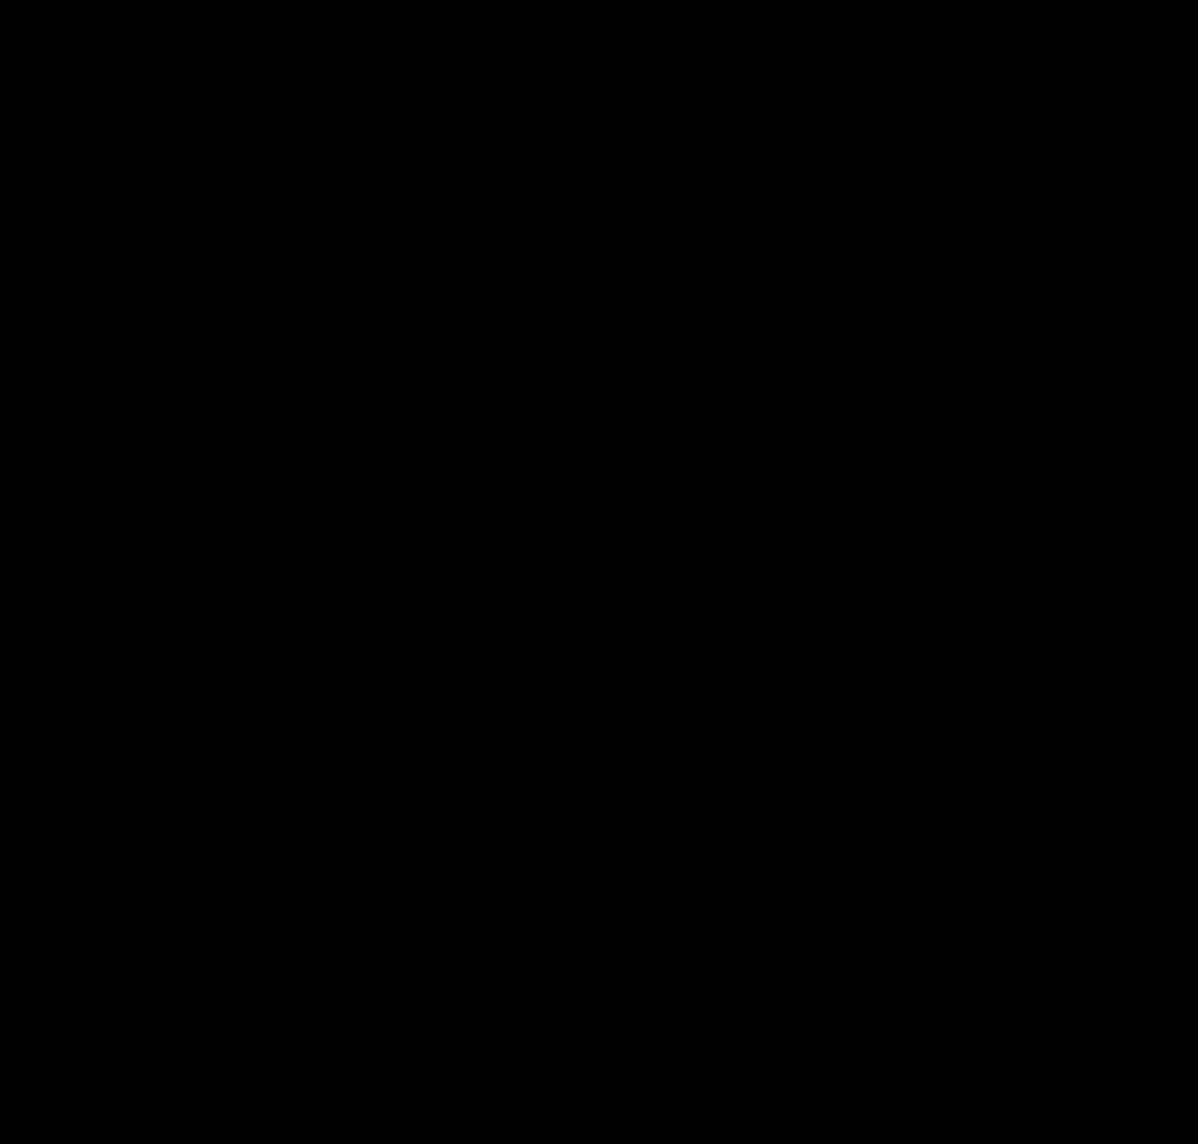 AMORC